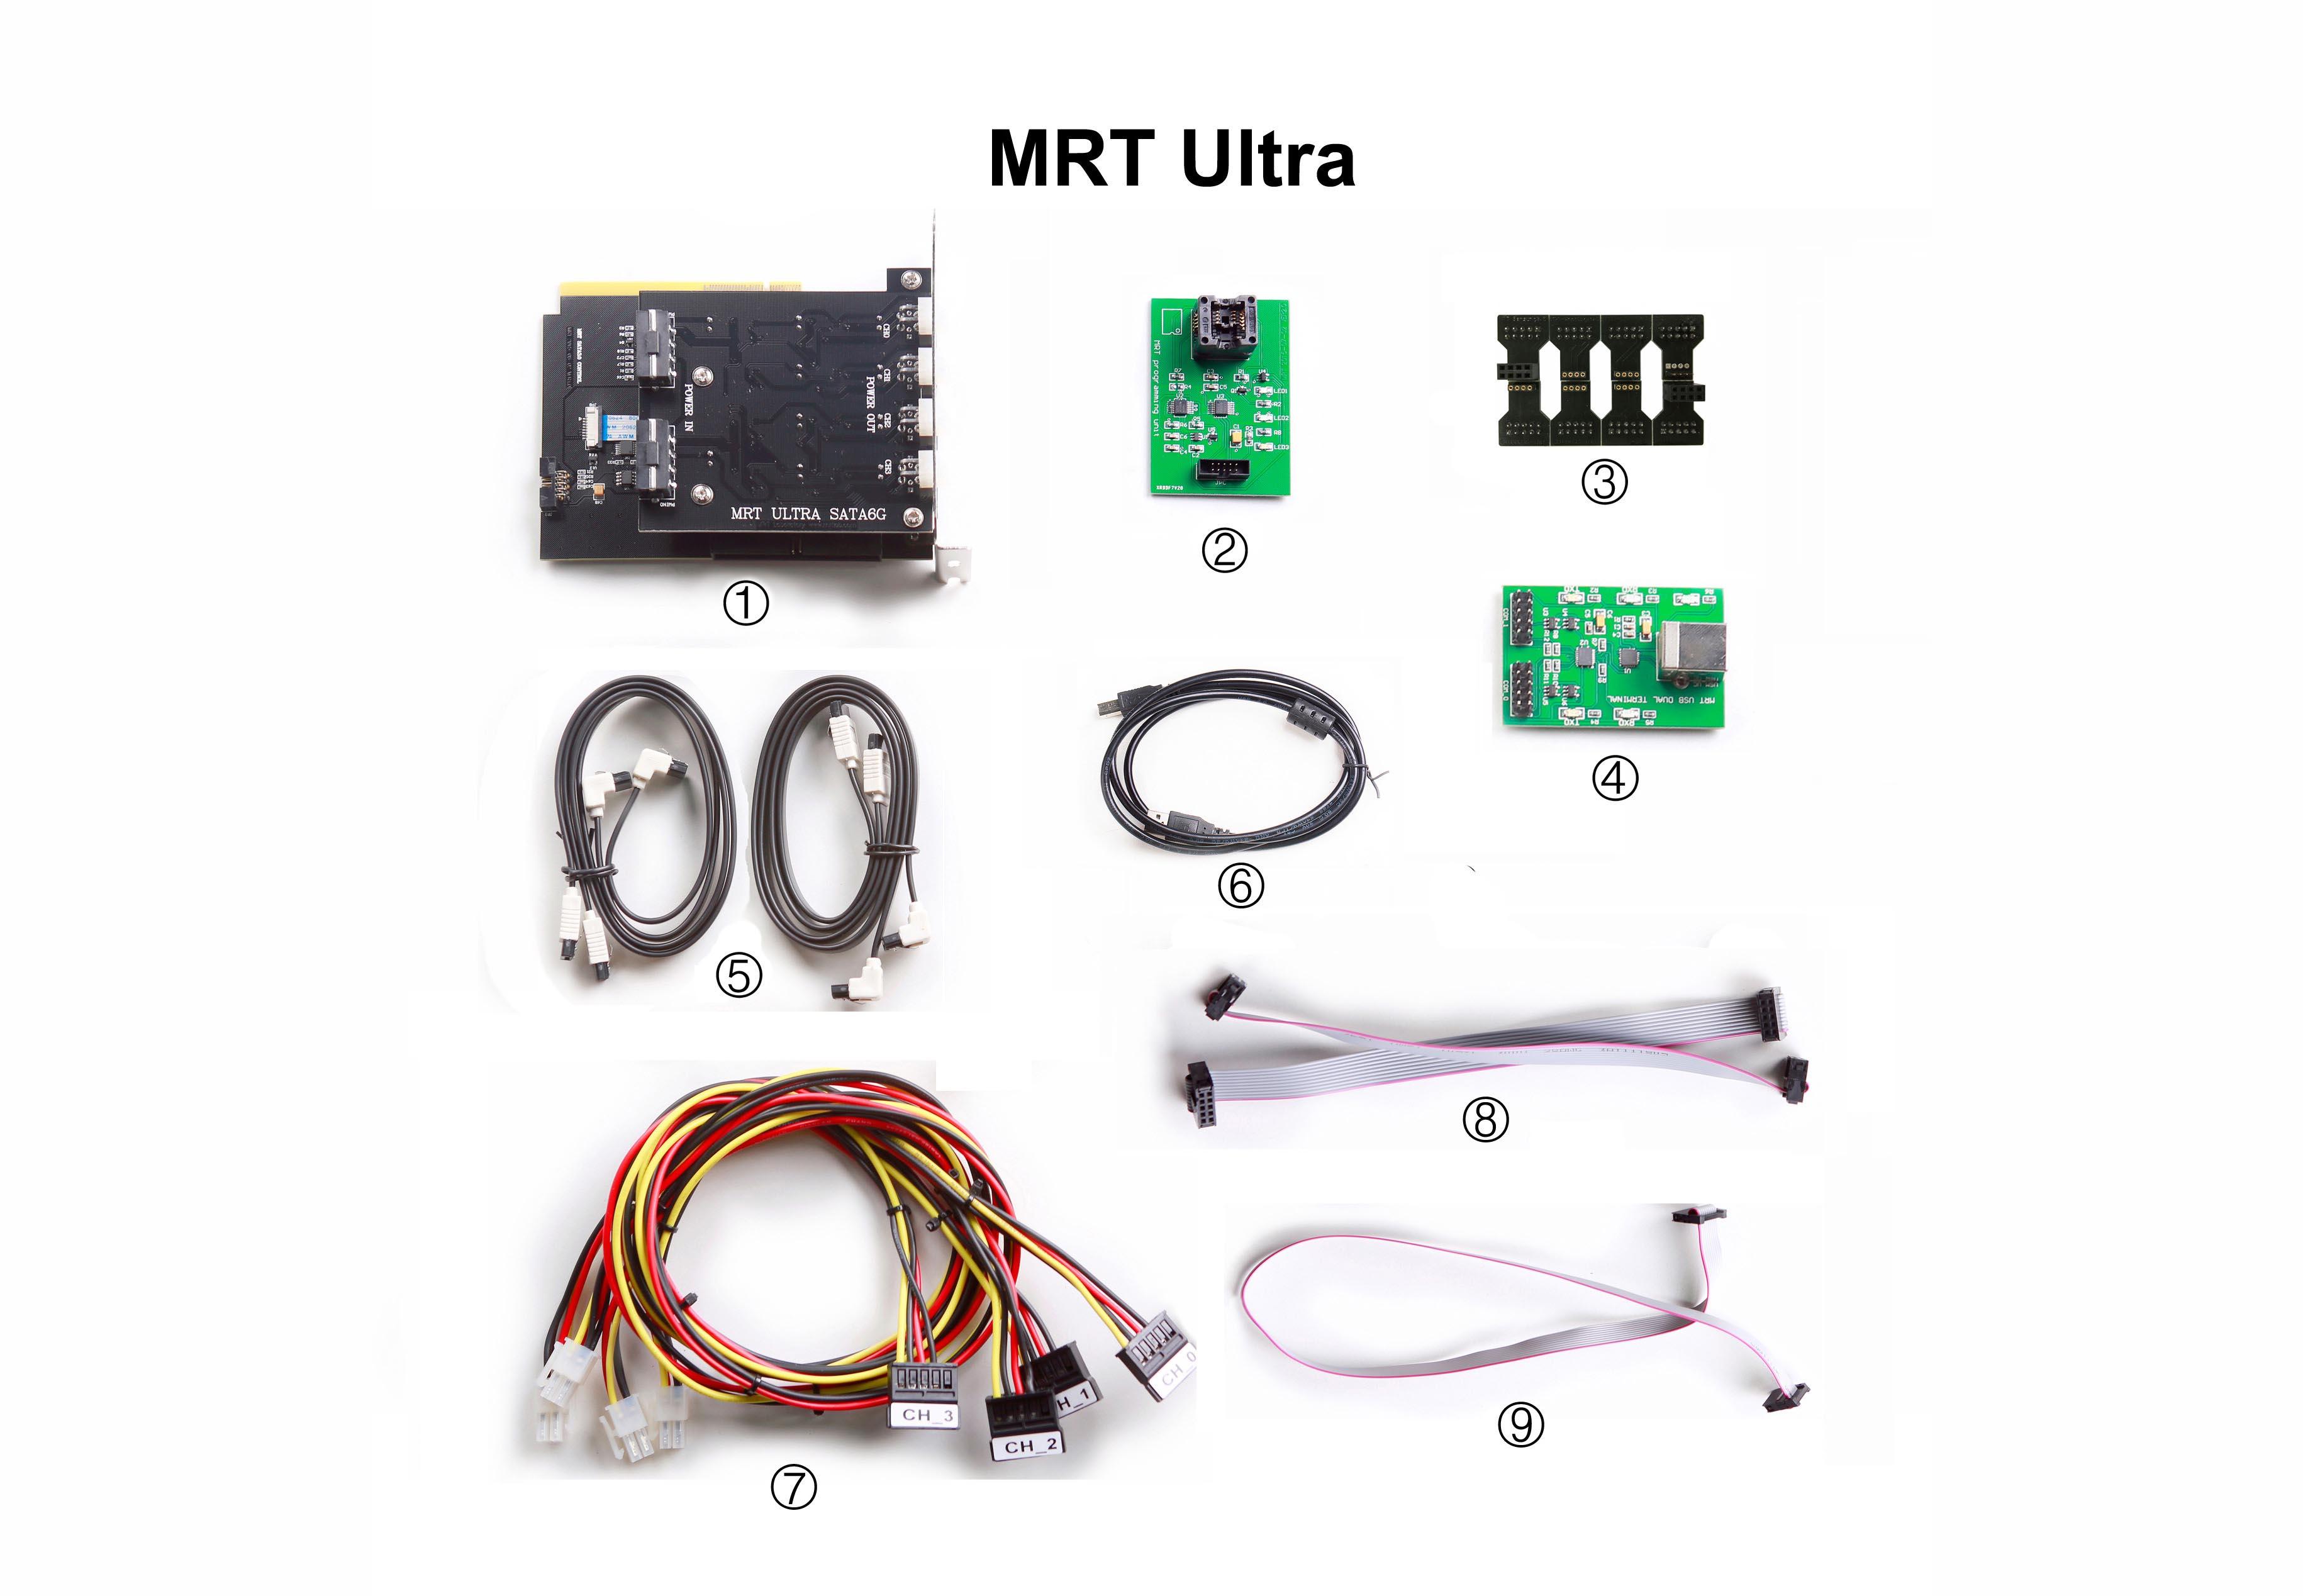 MRT Ultra Image 2